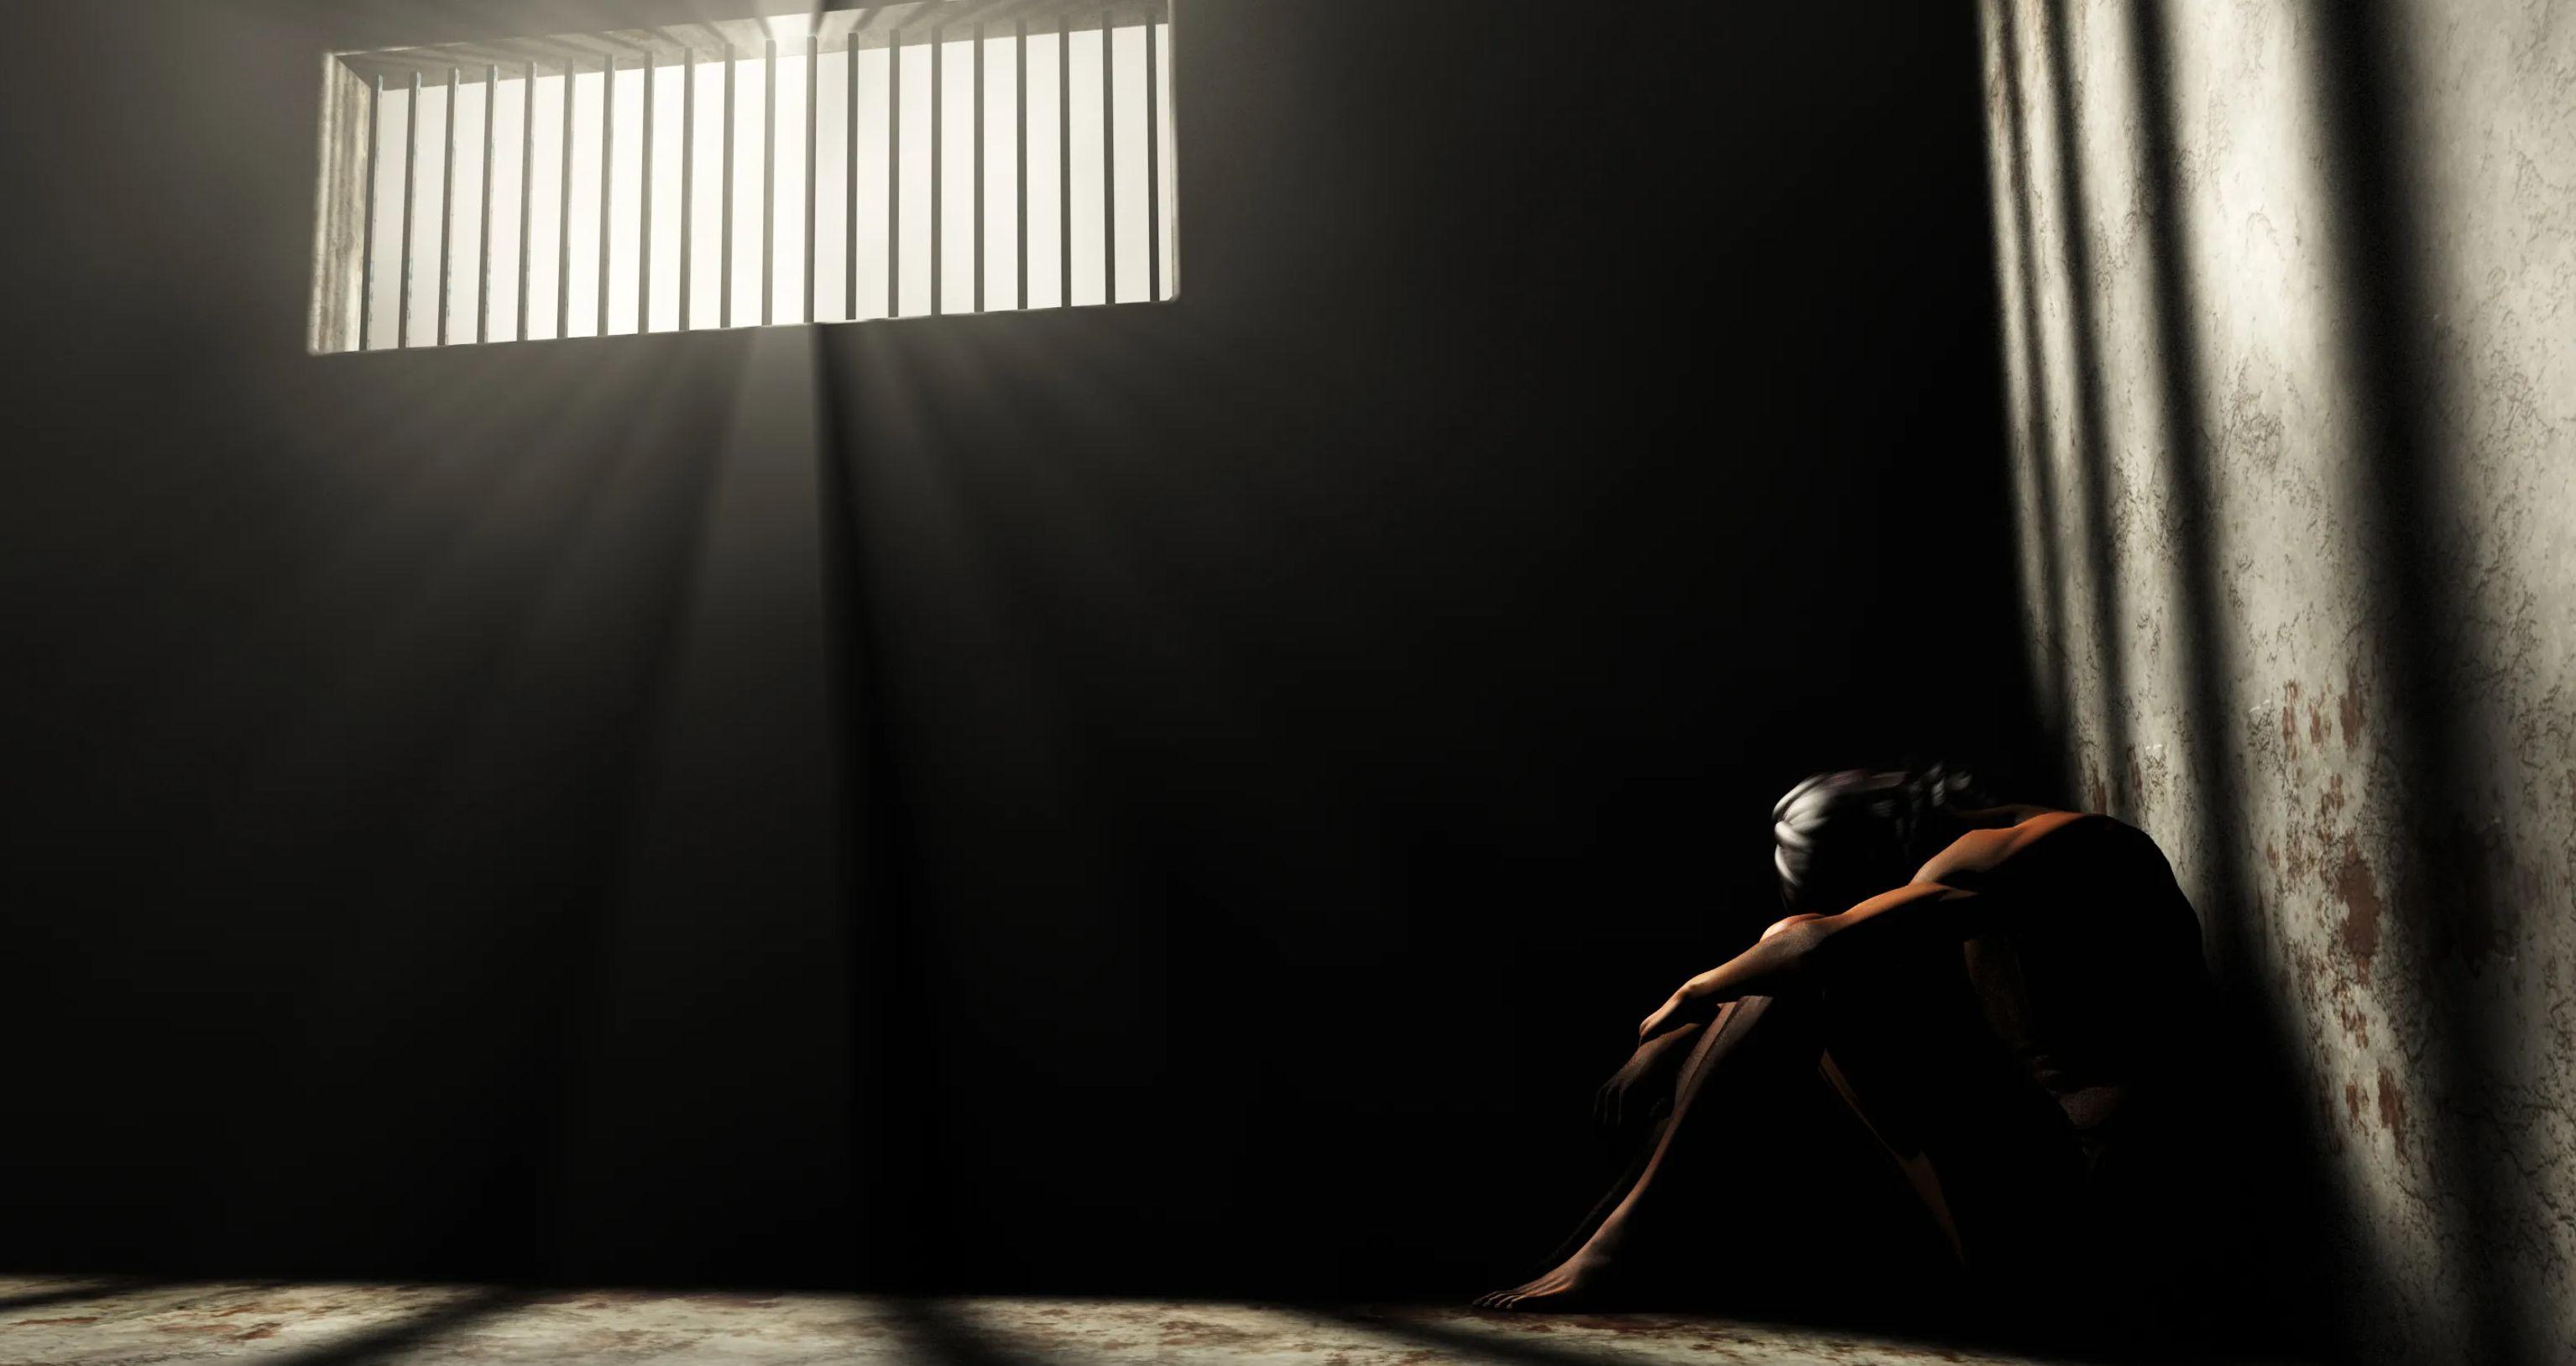 Photo illustration shows prisoner in solitary confinement.